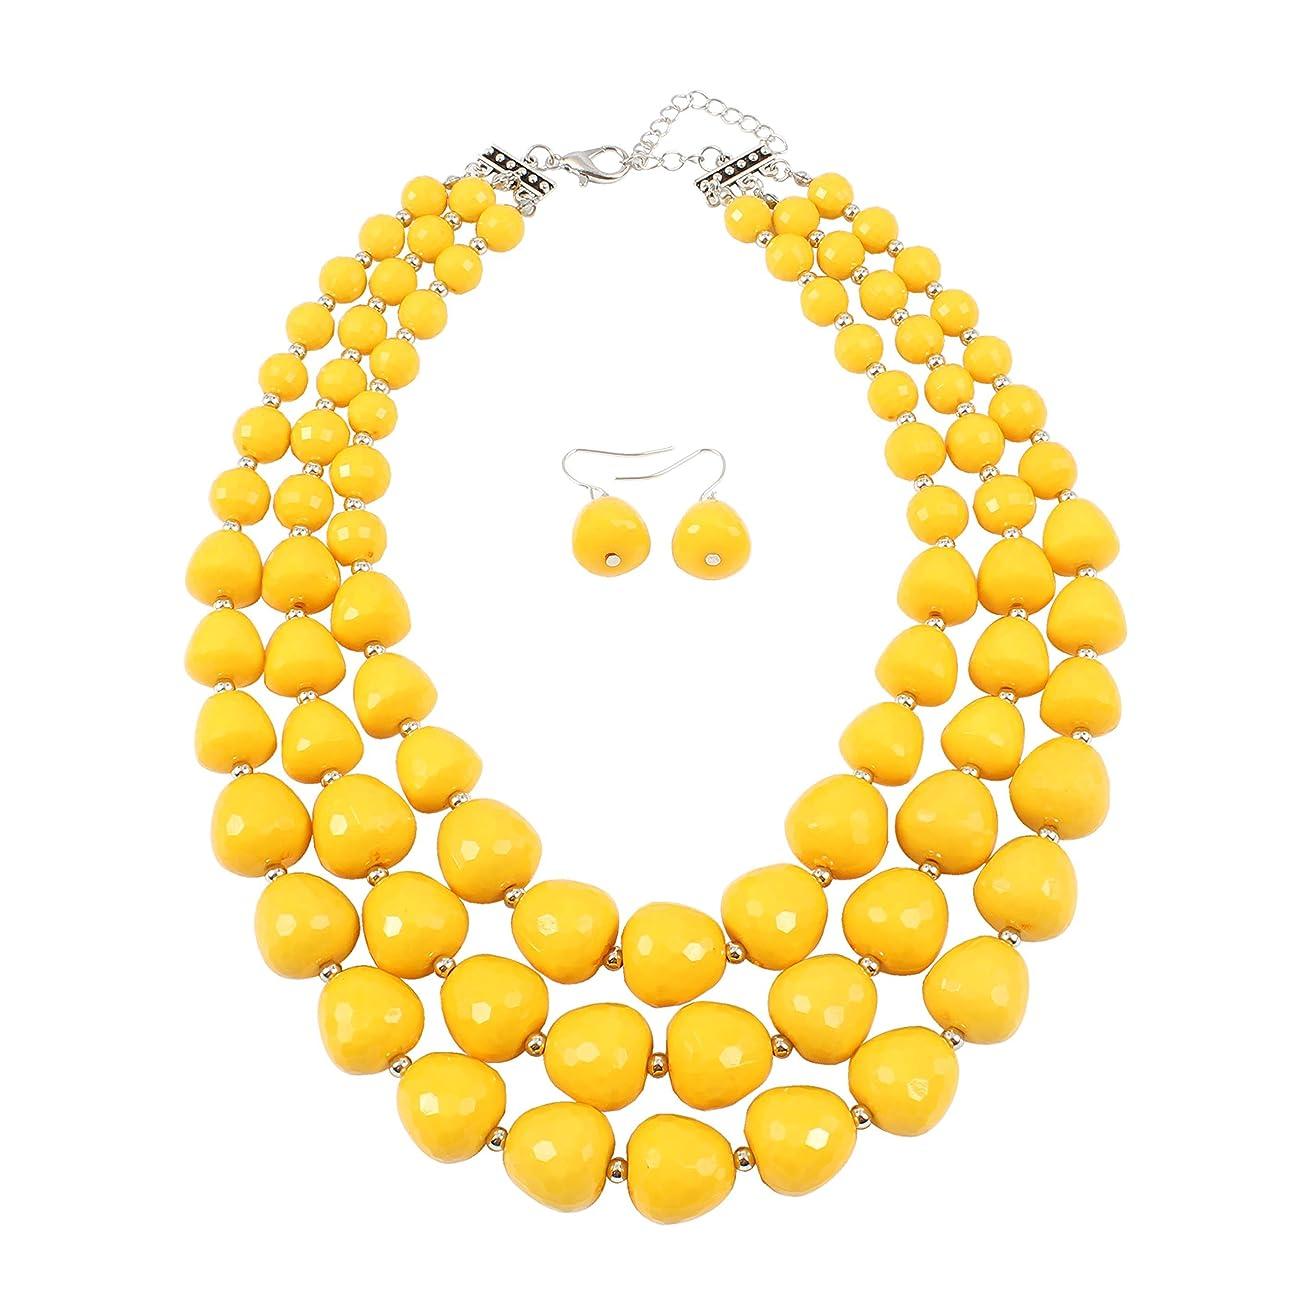 KOSMOS-LI 5 Colors Acrylic Beads Statement Strand Necklaces